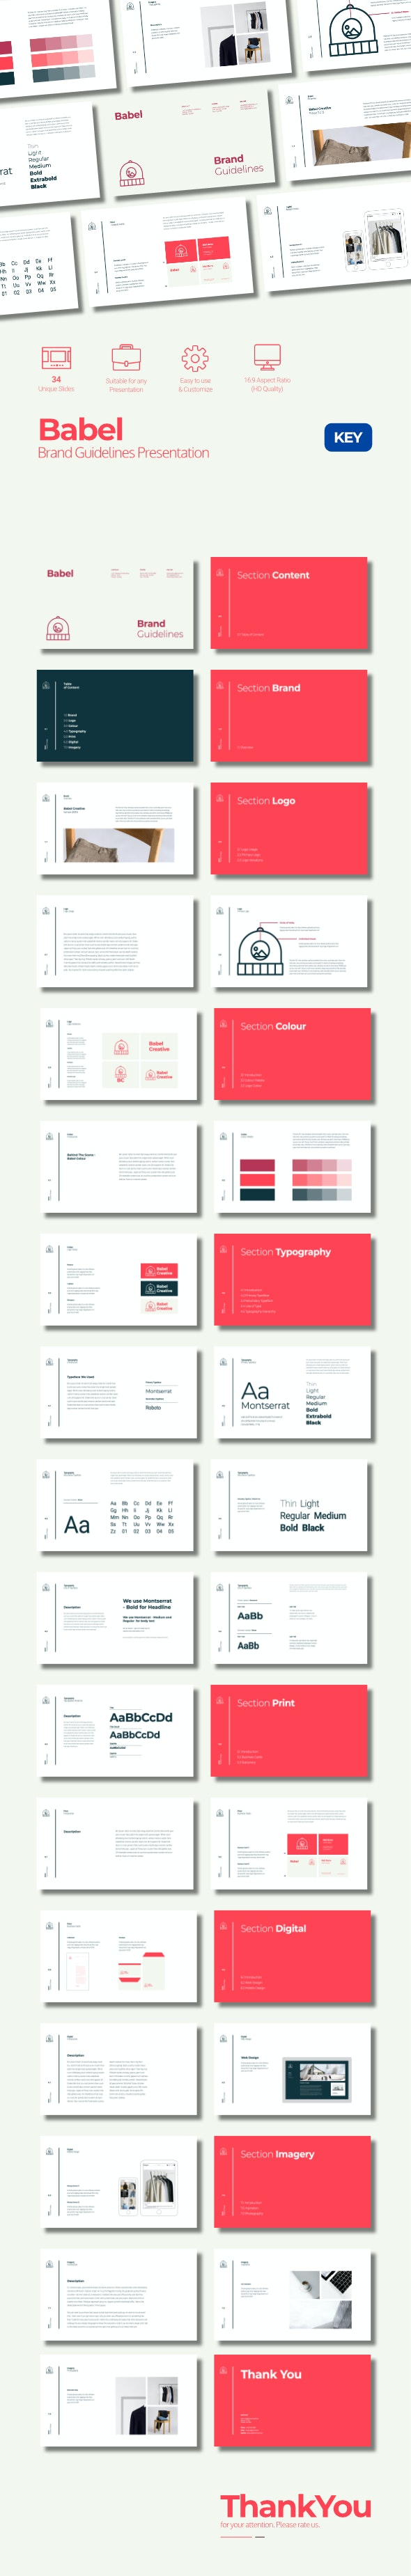 Babel - Clean Minimalism Brand Guidelines Presentation Keynote - Business Keynote Templates